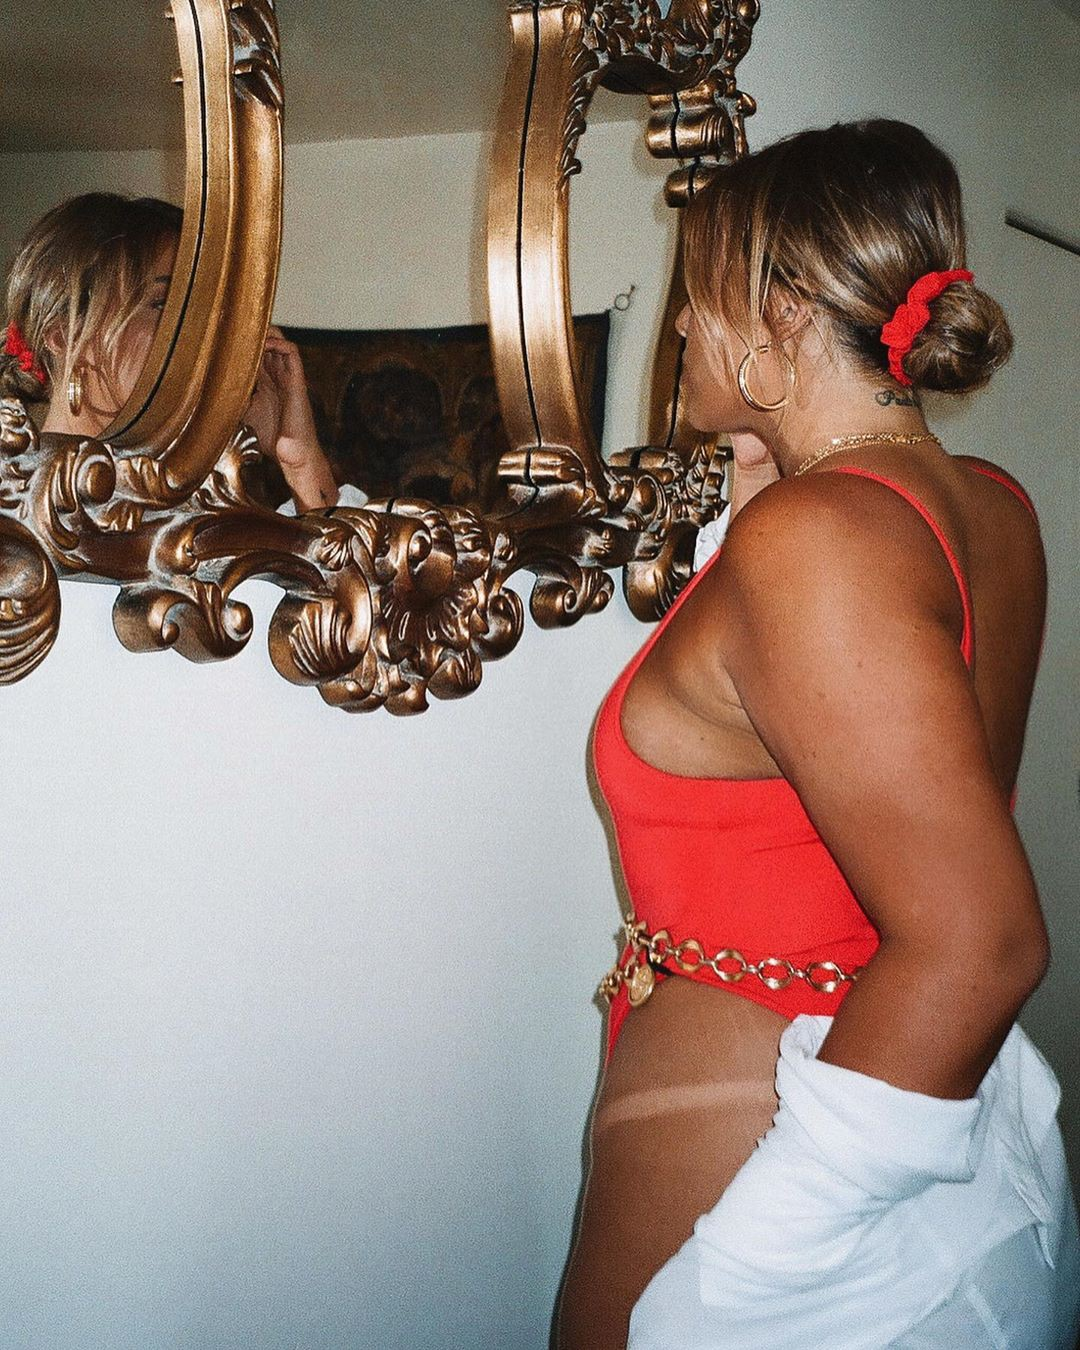 Stephanie Viada hot instagram photo, dress fashion accessory colour dress